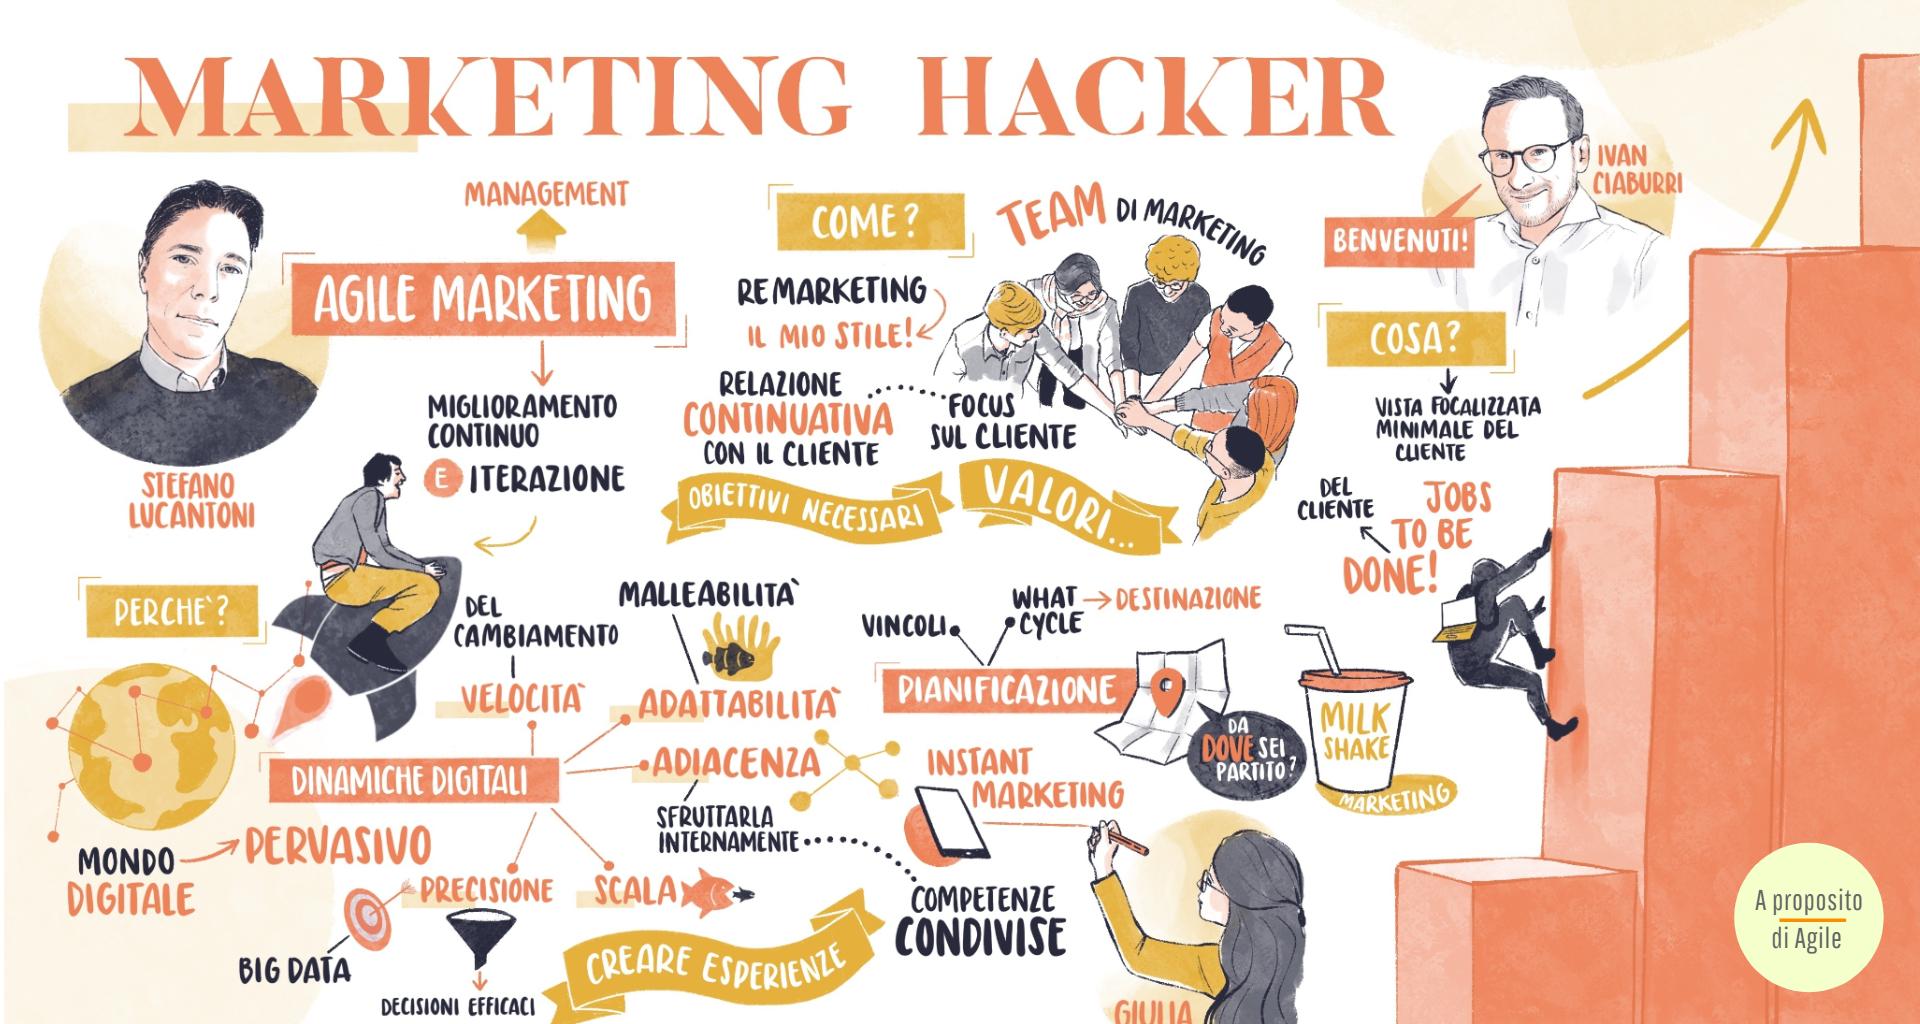 Agile Marketing - Webinar - inspearit - A proposito di Agile - Giulia Coppola